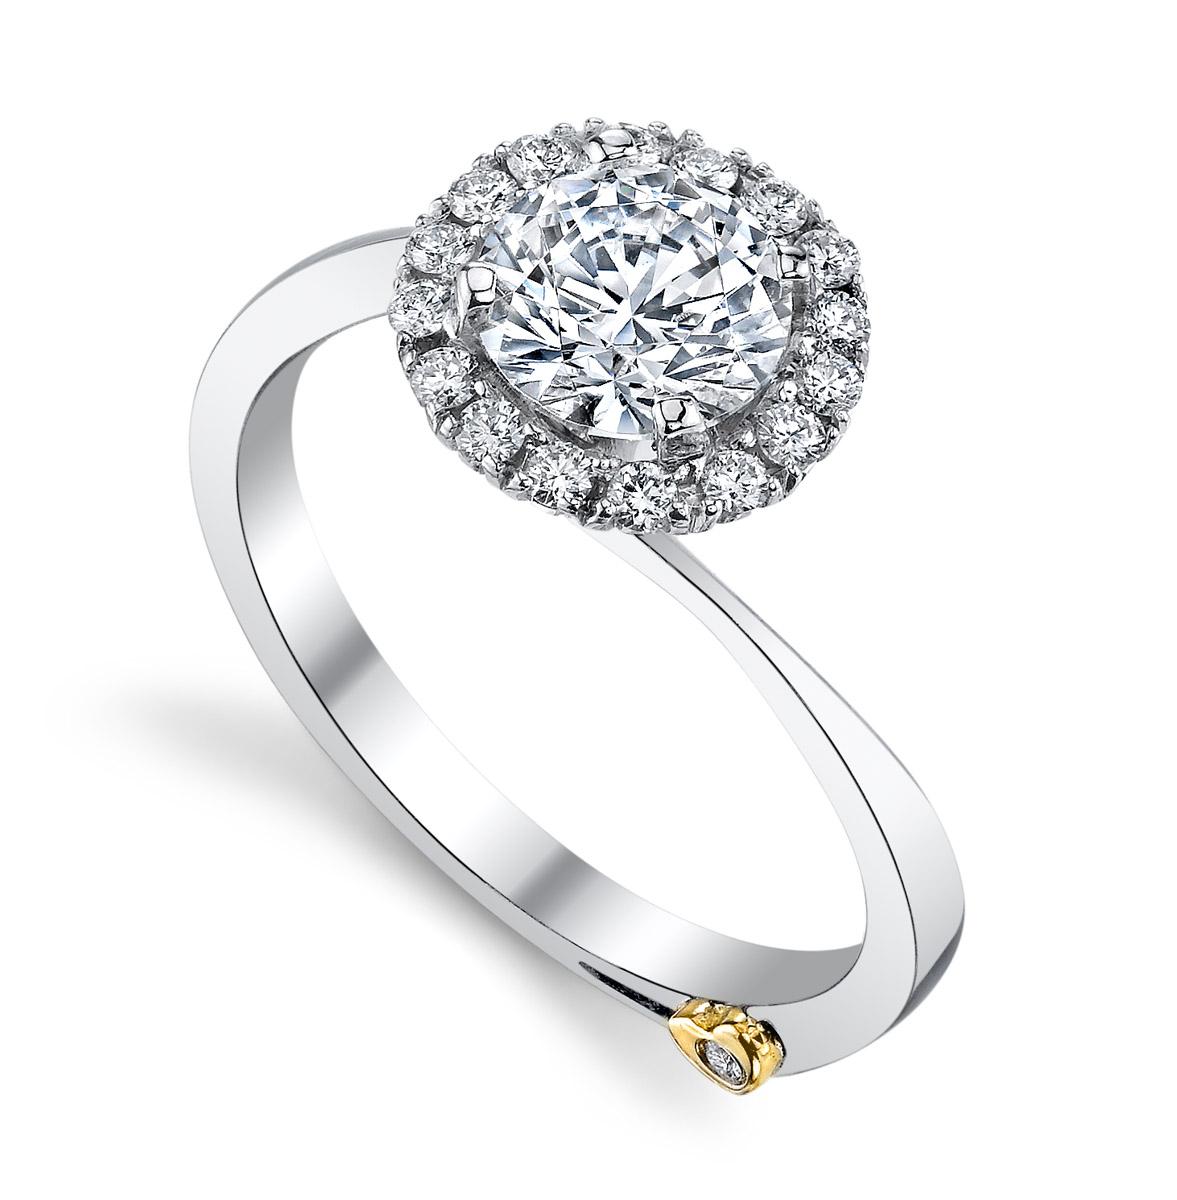 Mark Schneider : Angelic Contemporary Engagement Ring - tilt